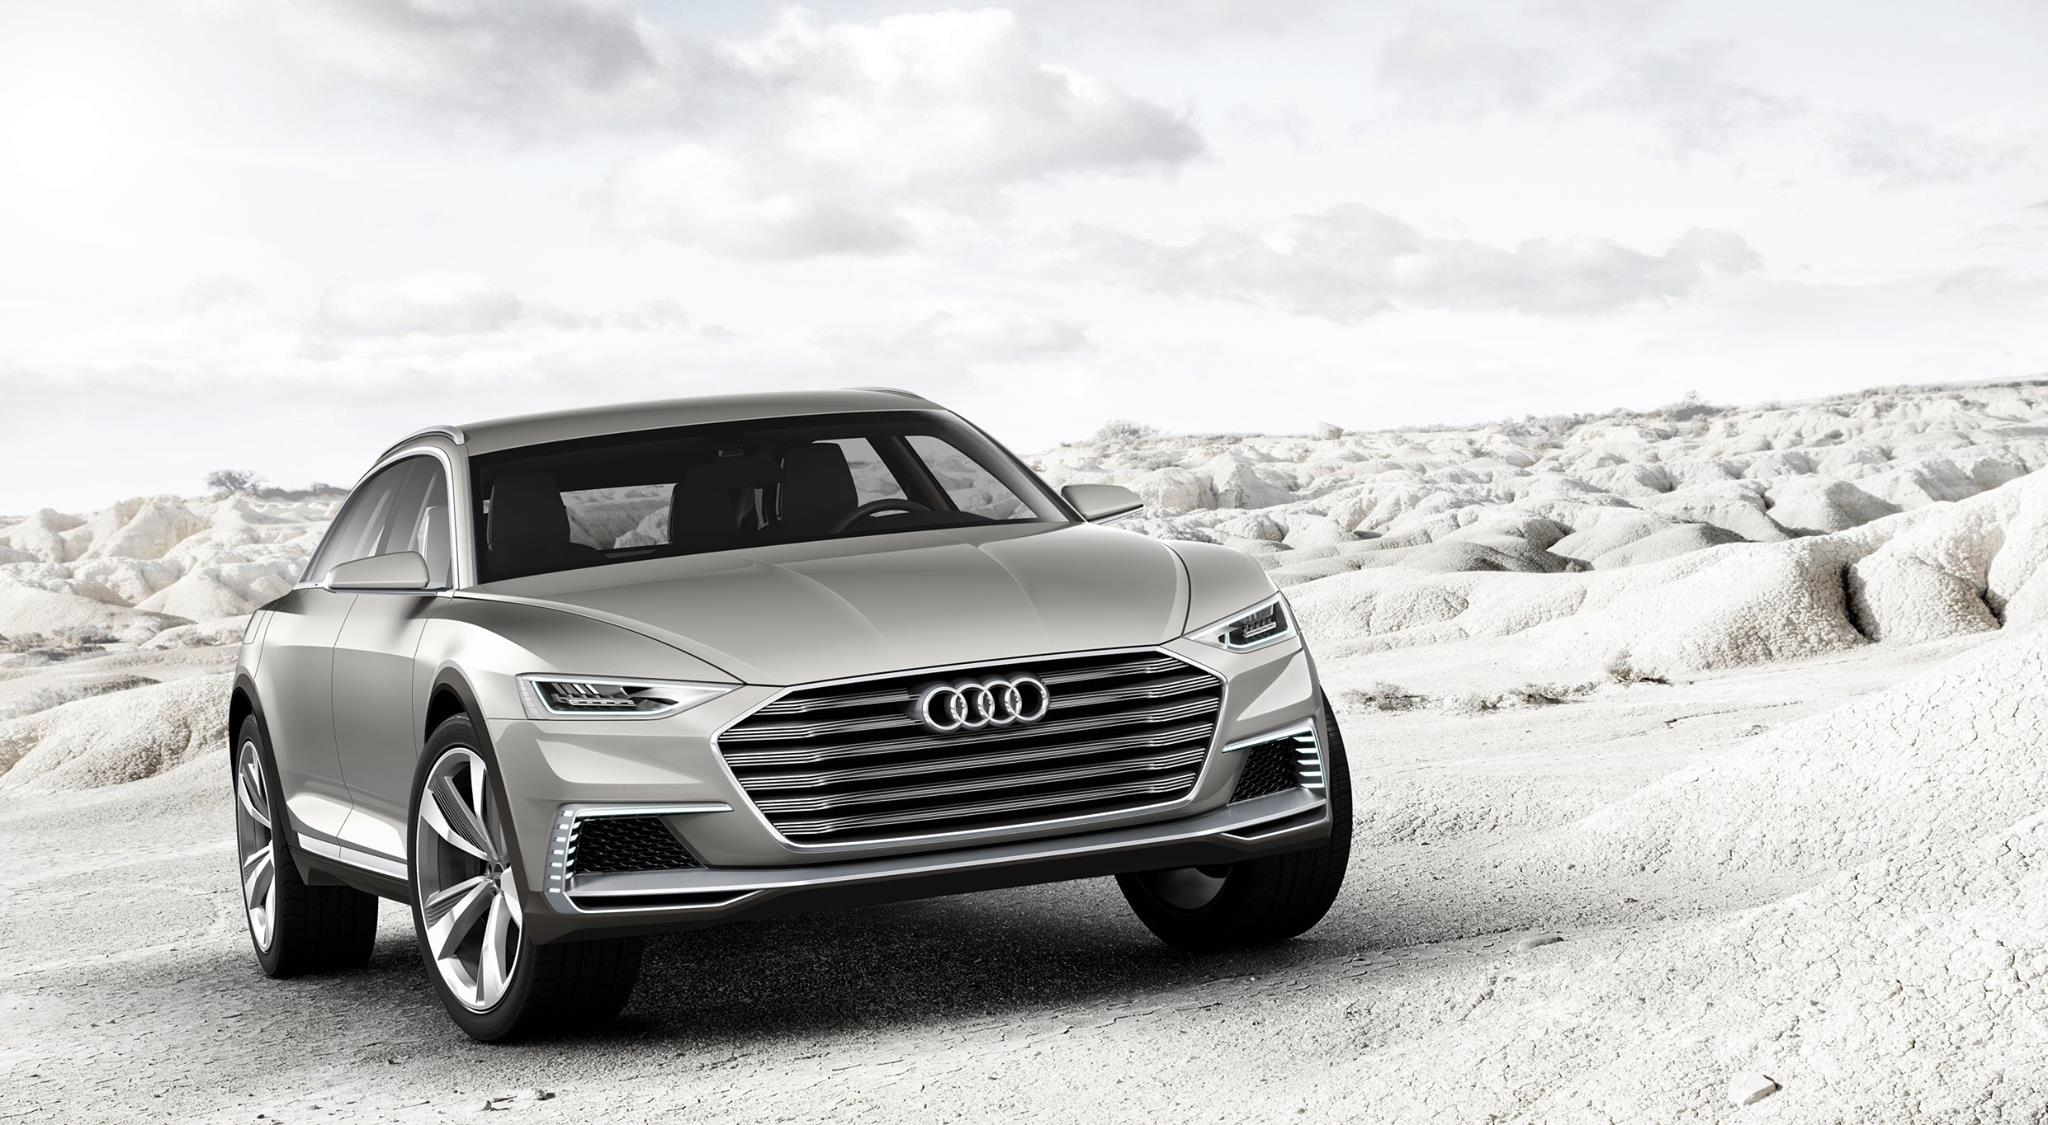 New Audi Prologue allroad Concept Previews Flagship Softroader at